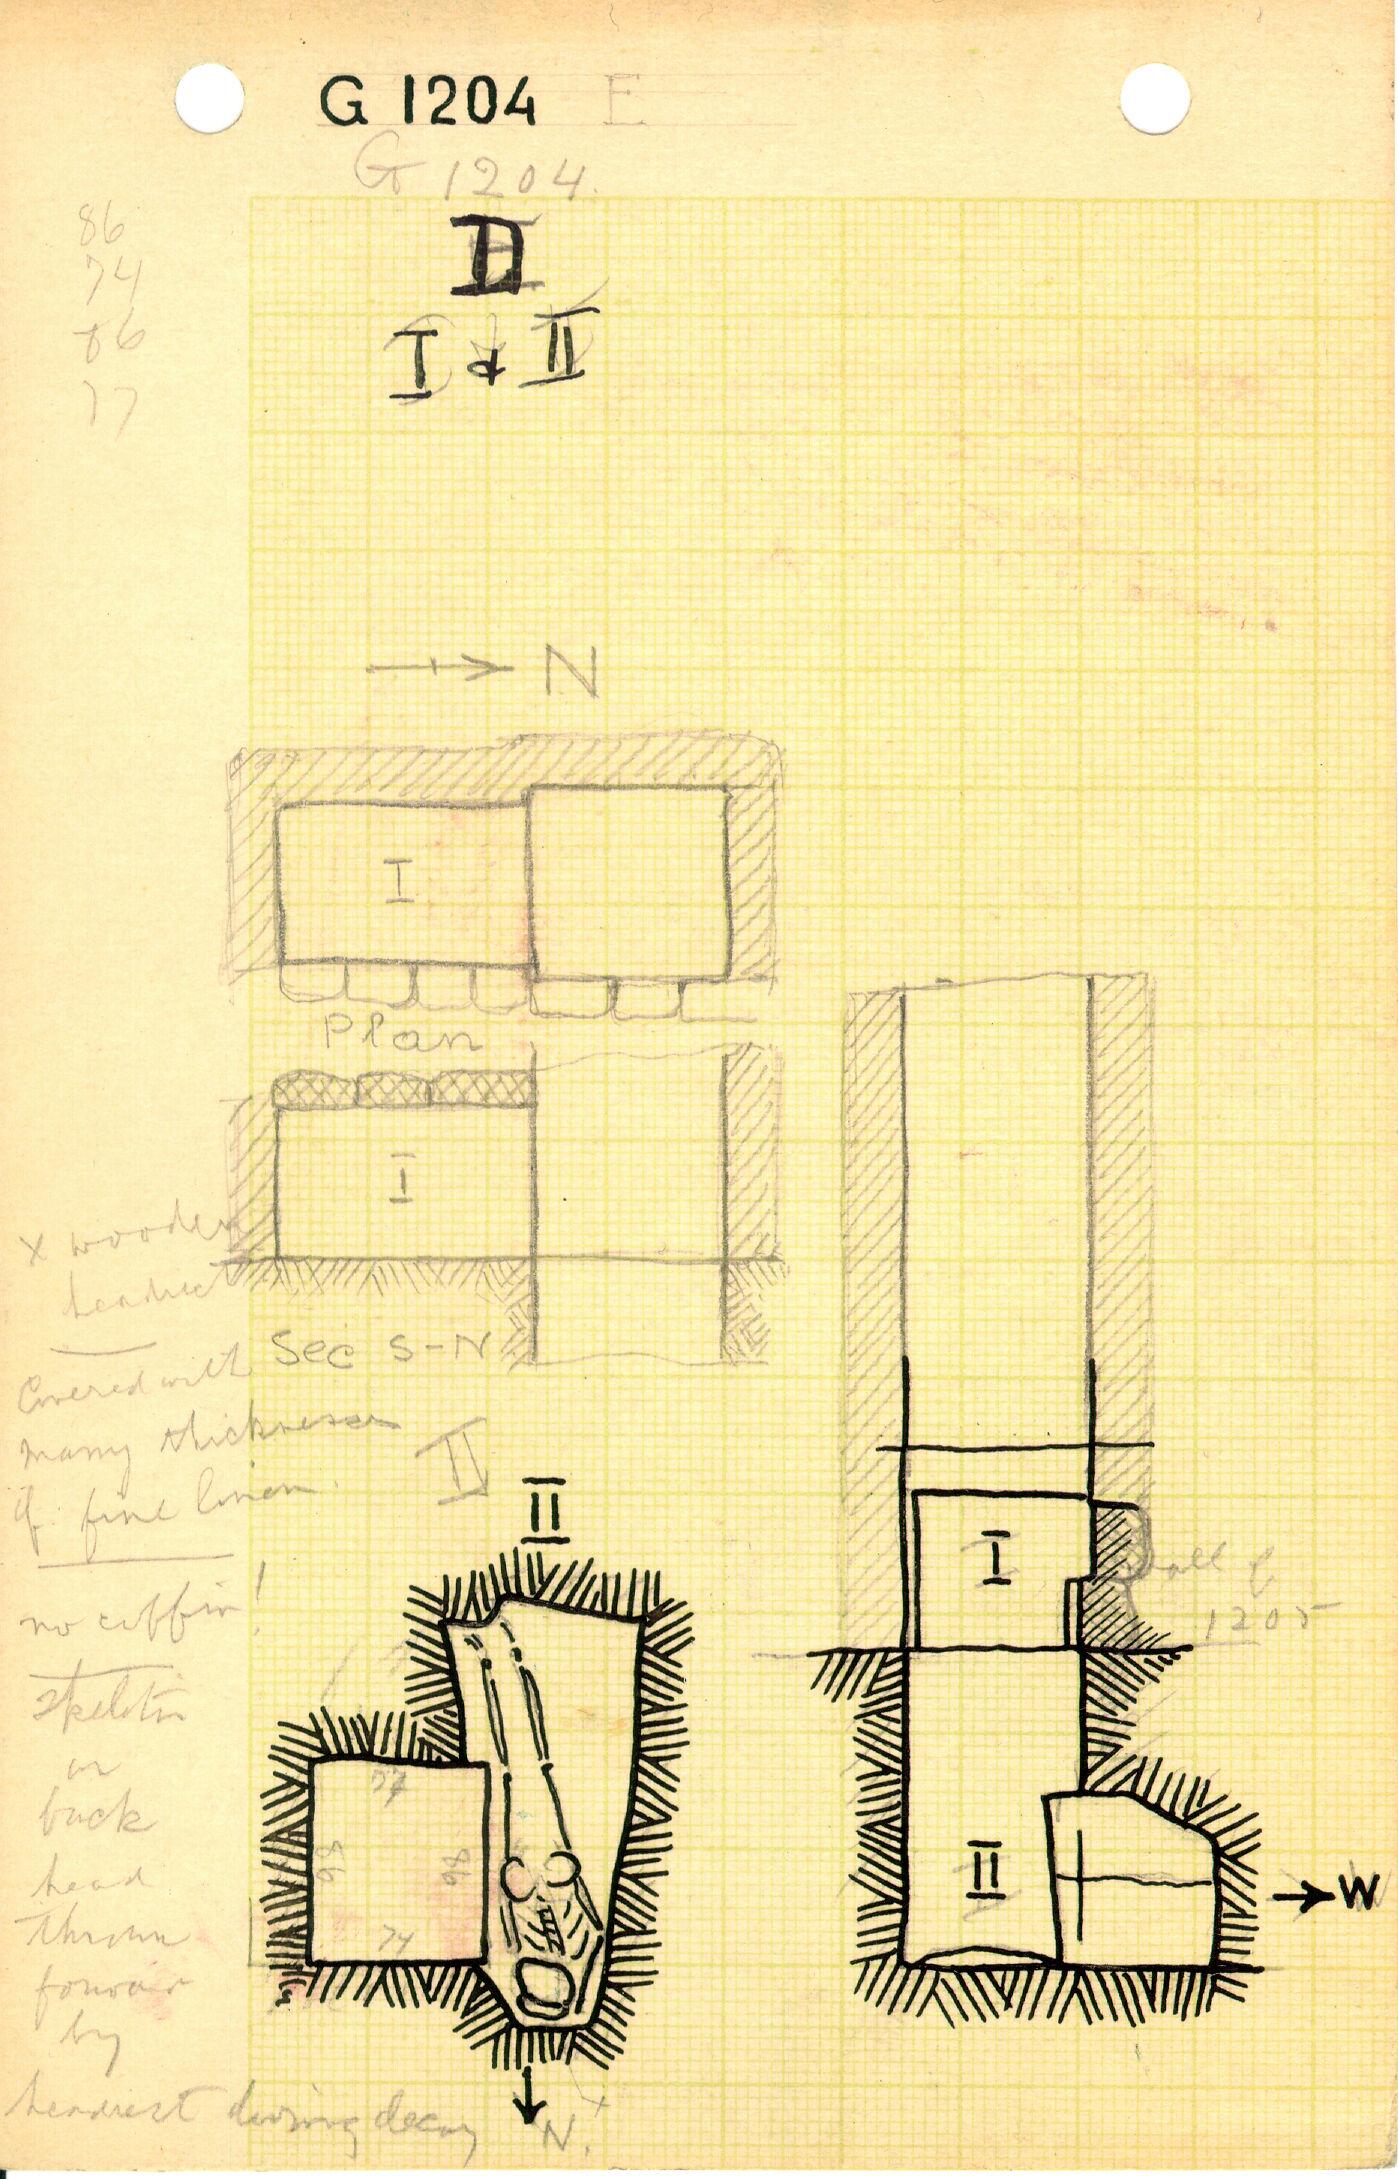 Maps and plans: G 1204, Shaft D (I & II)